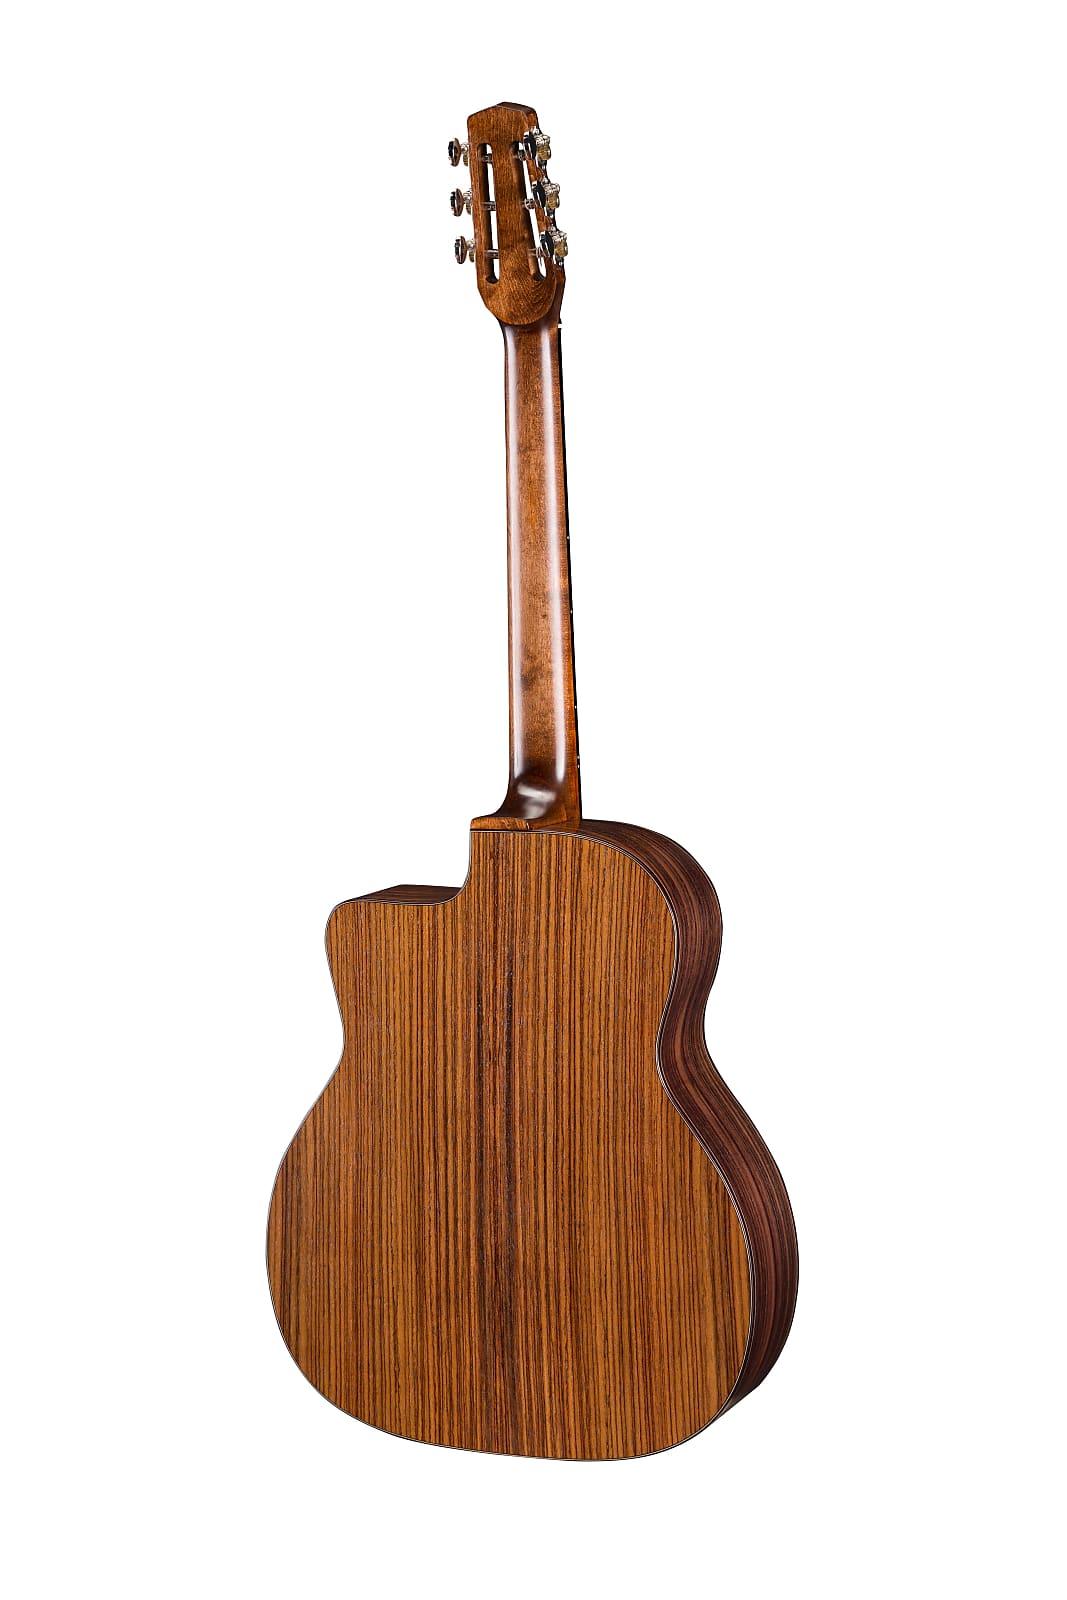 Eastman DM1 Gypsy Jazz Acoustic Guitar Natural w/ Gig Bag